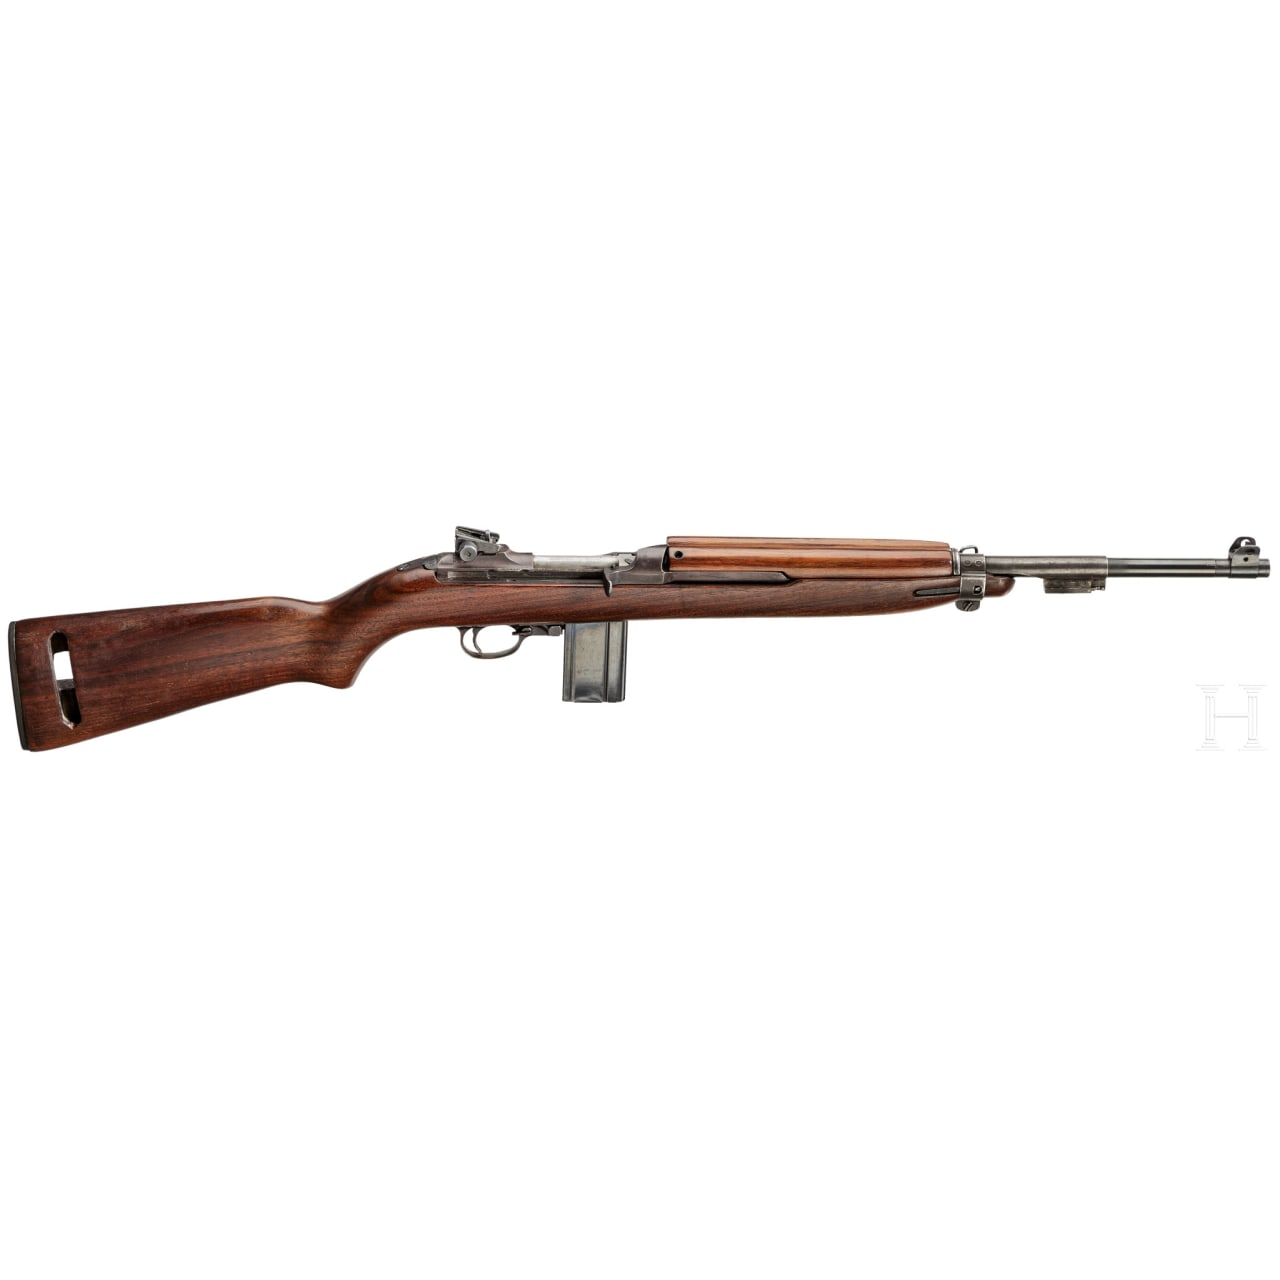 Carbine 30 M 1, Winchester, Justiz Bayern